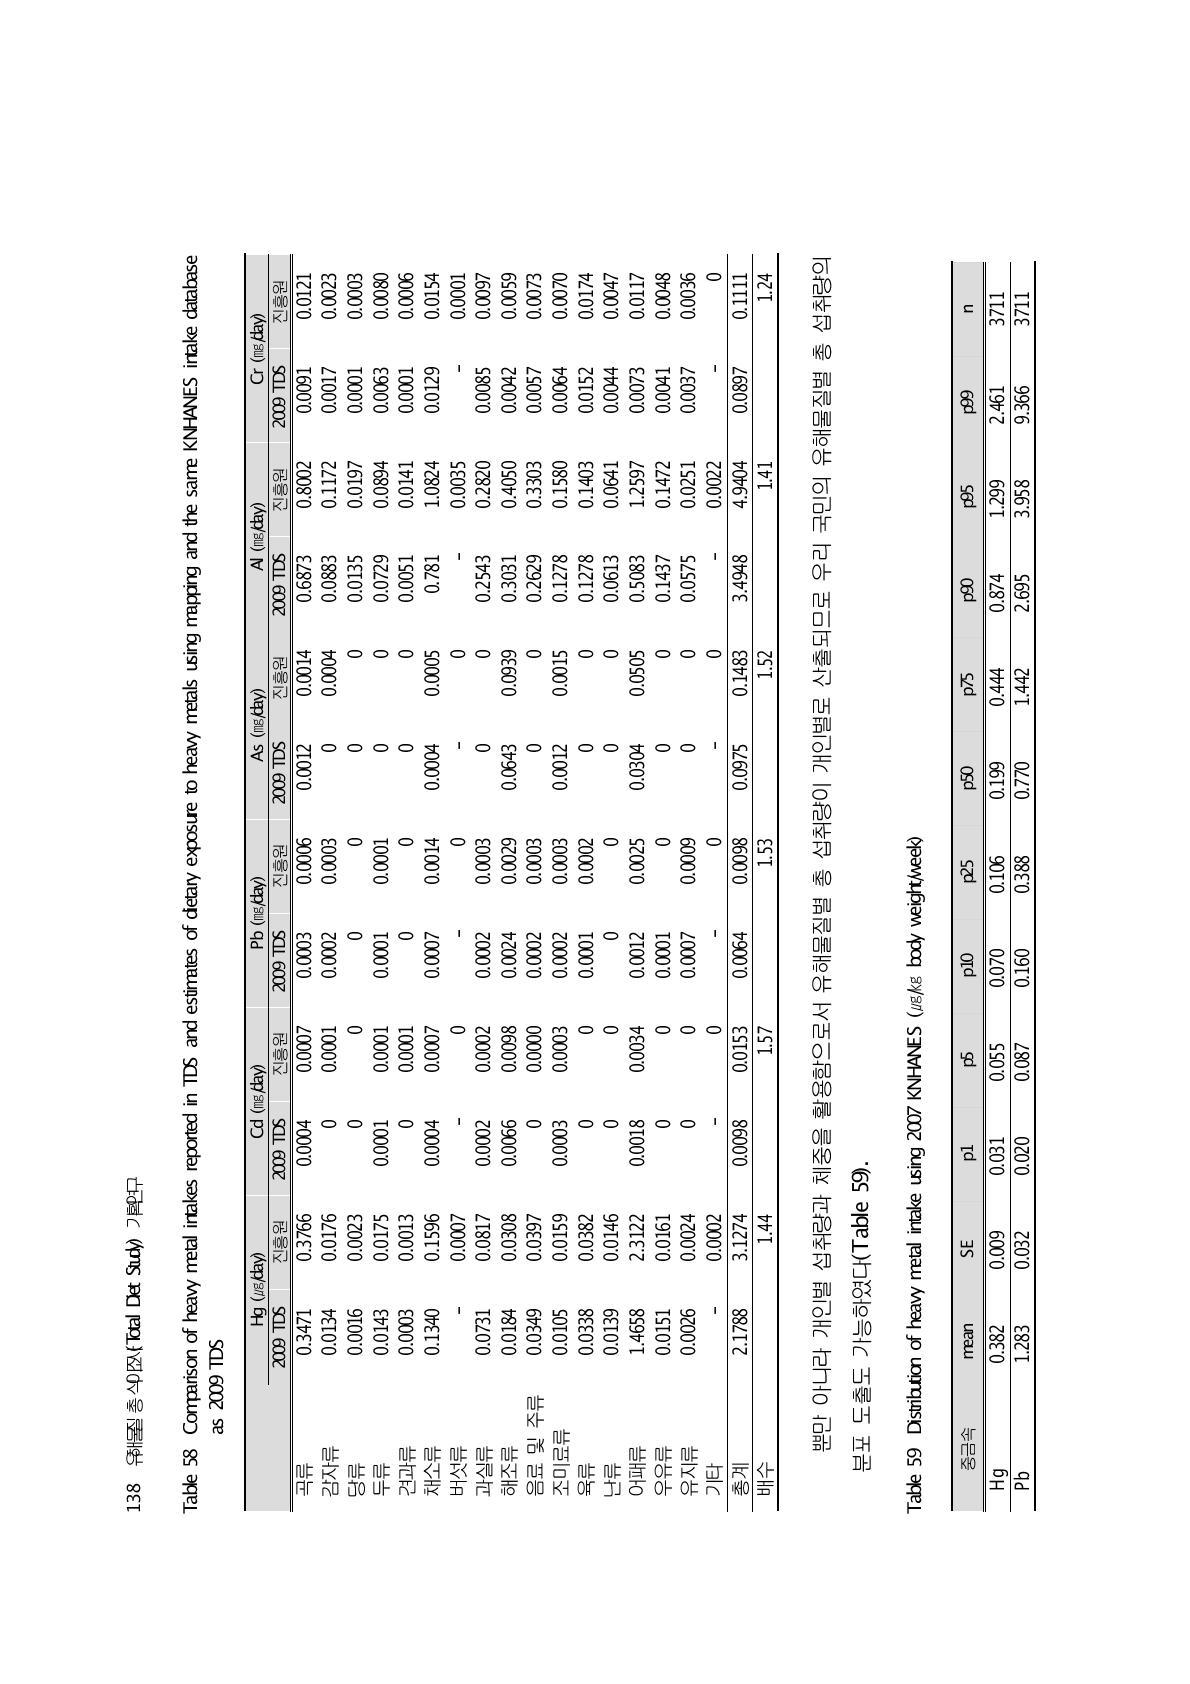 Distribution of heavy metal intake using 2007 KNHANES (㎍/㎏ body weight/week)